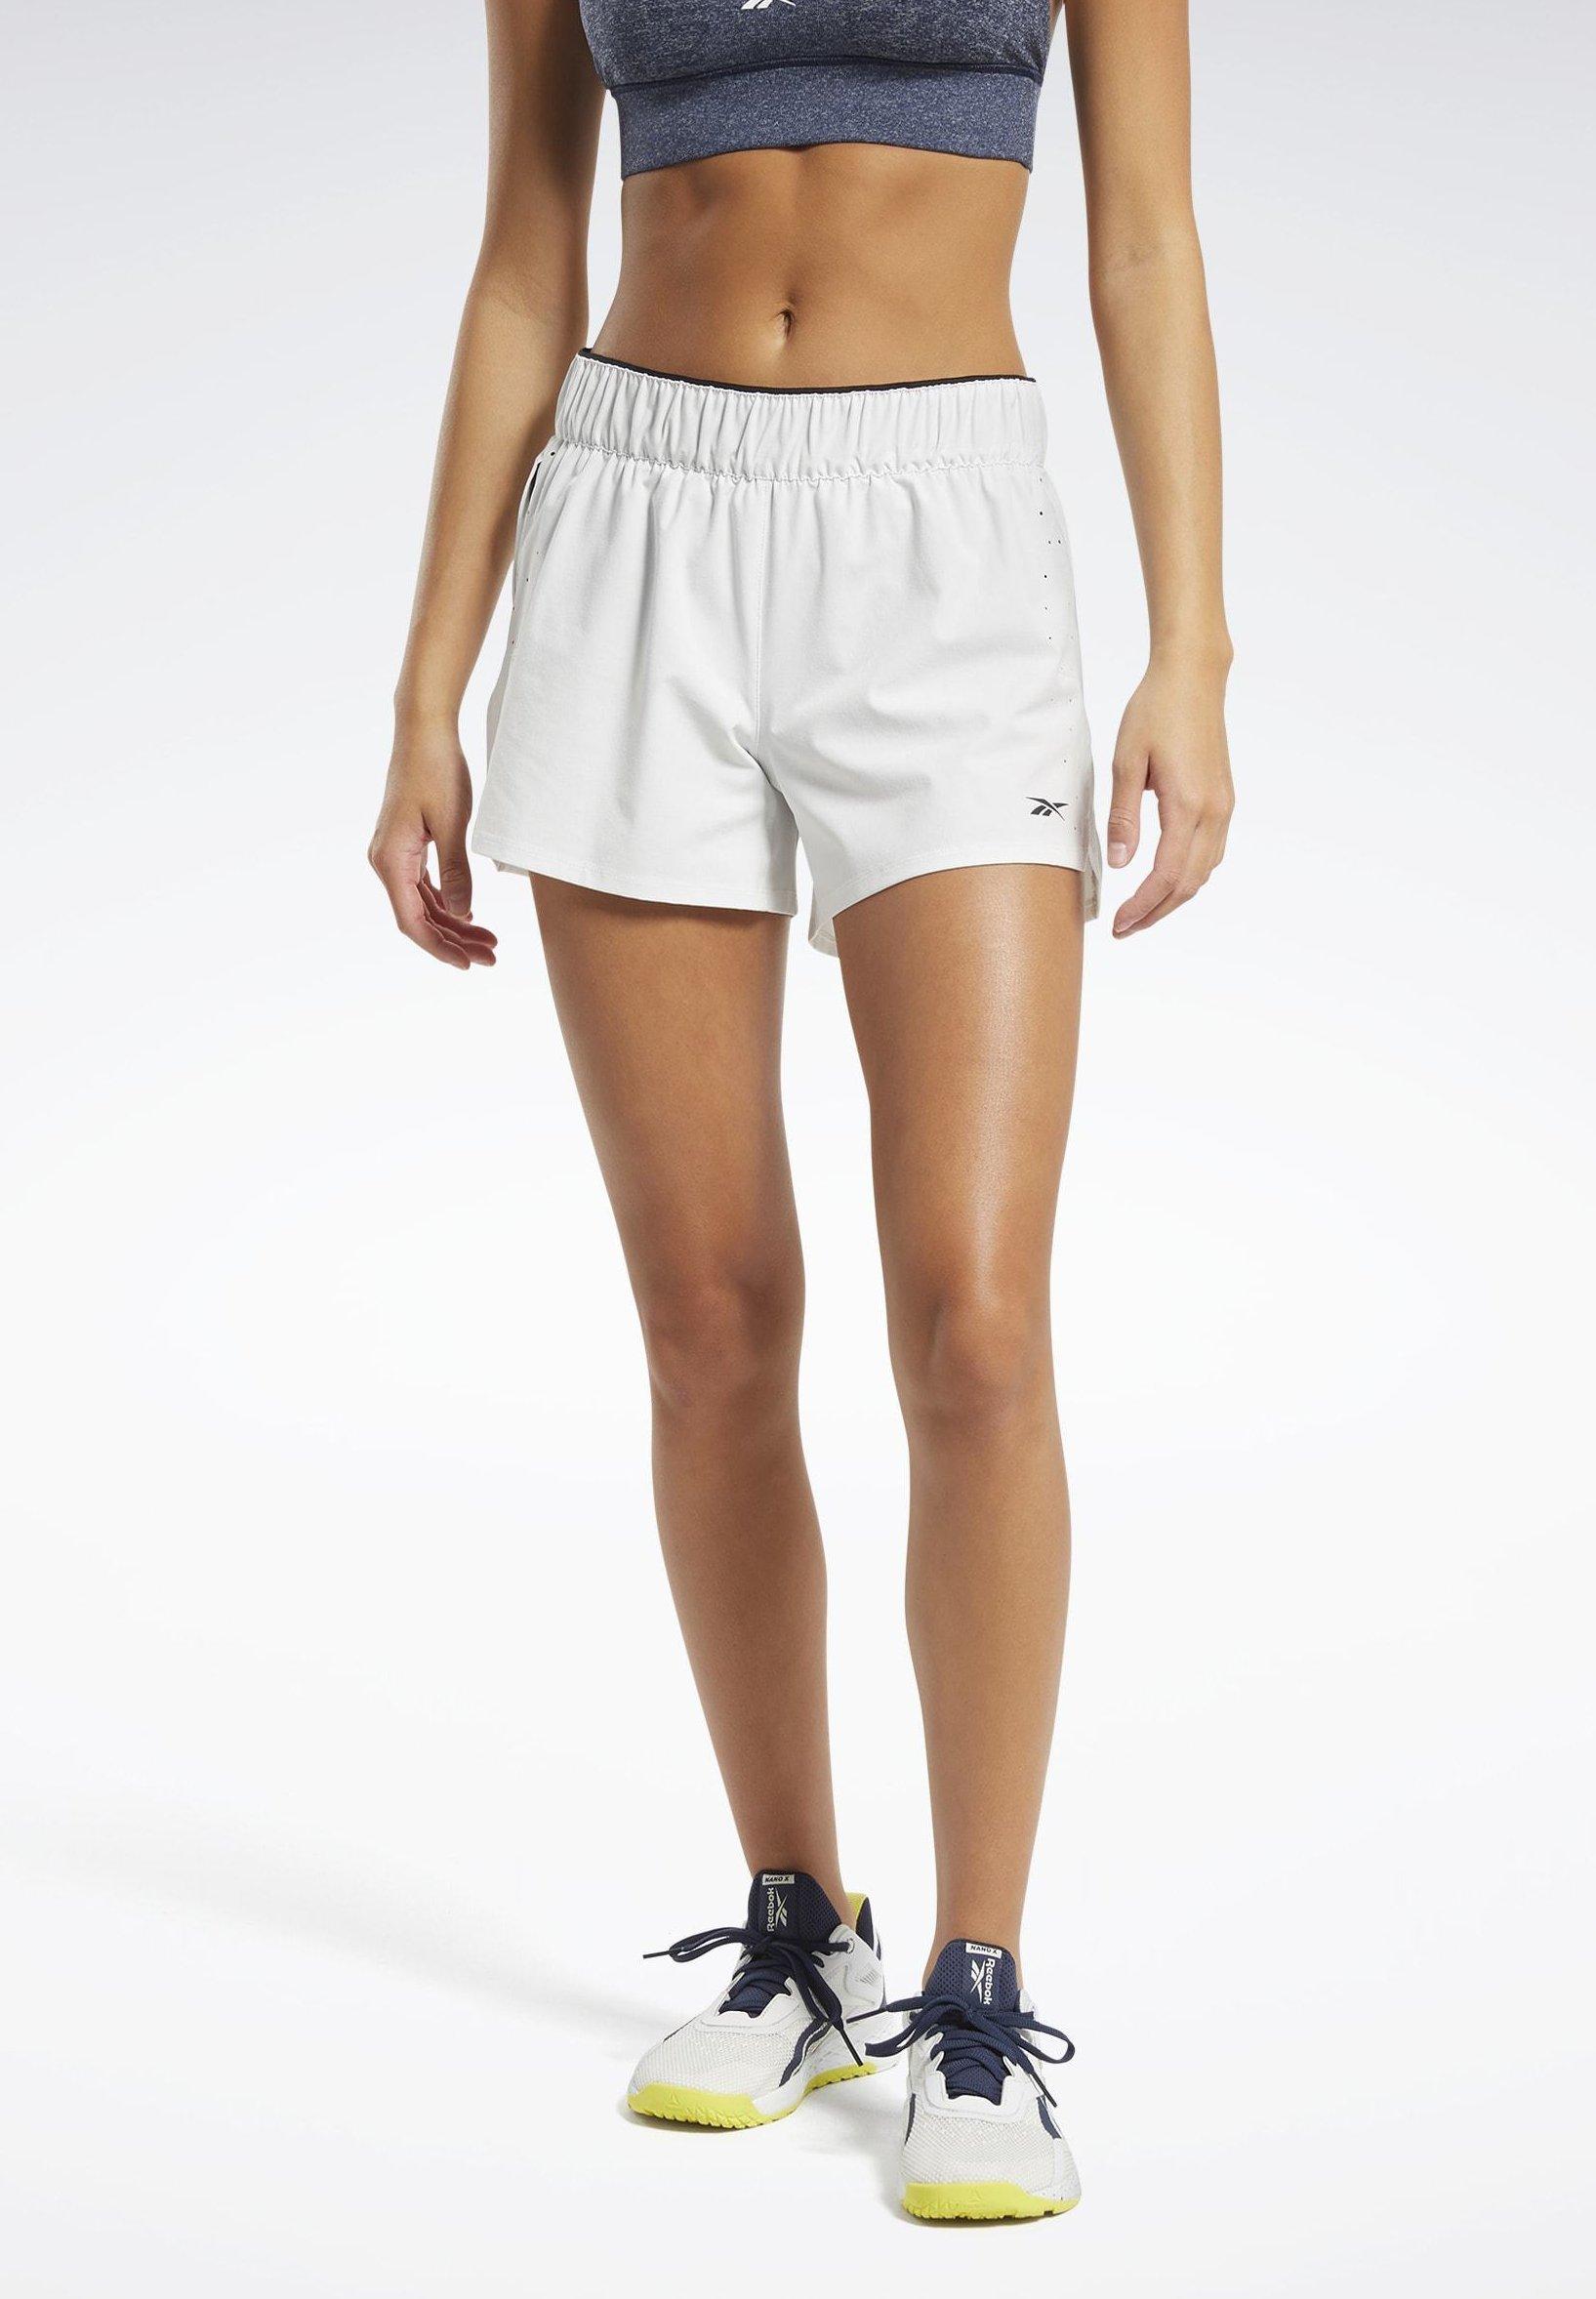 Reebok Damen Tight Shorts Sporthose Training Fitness Kurze